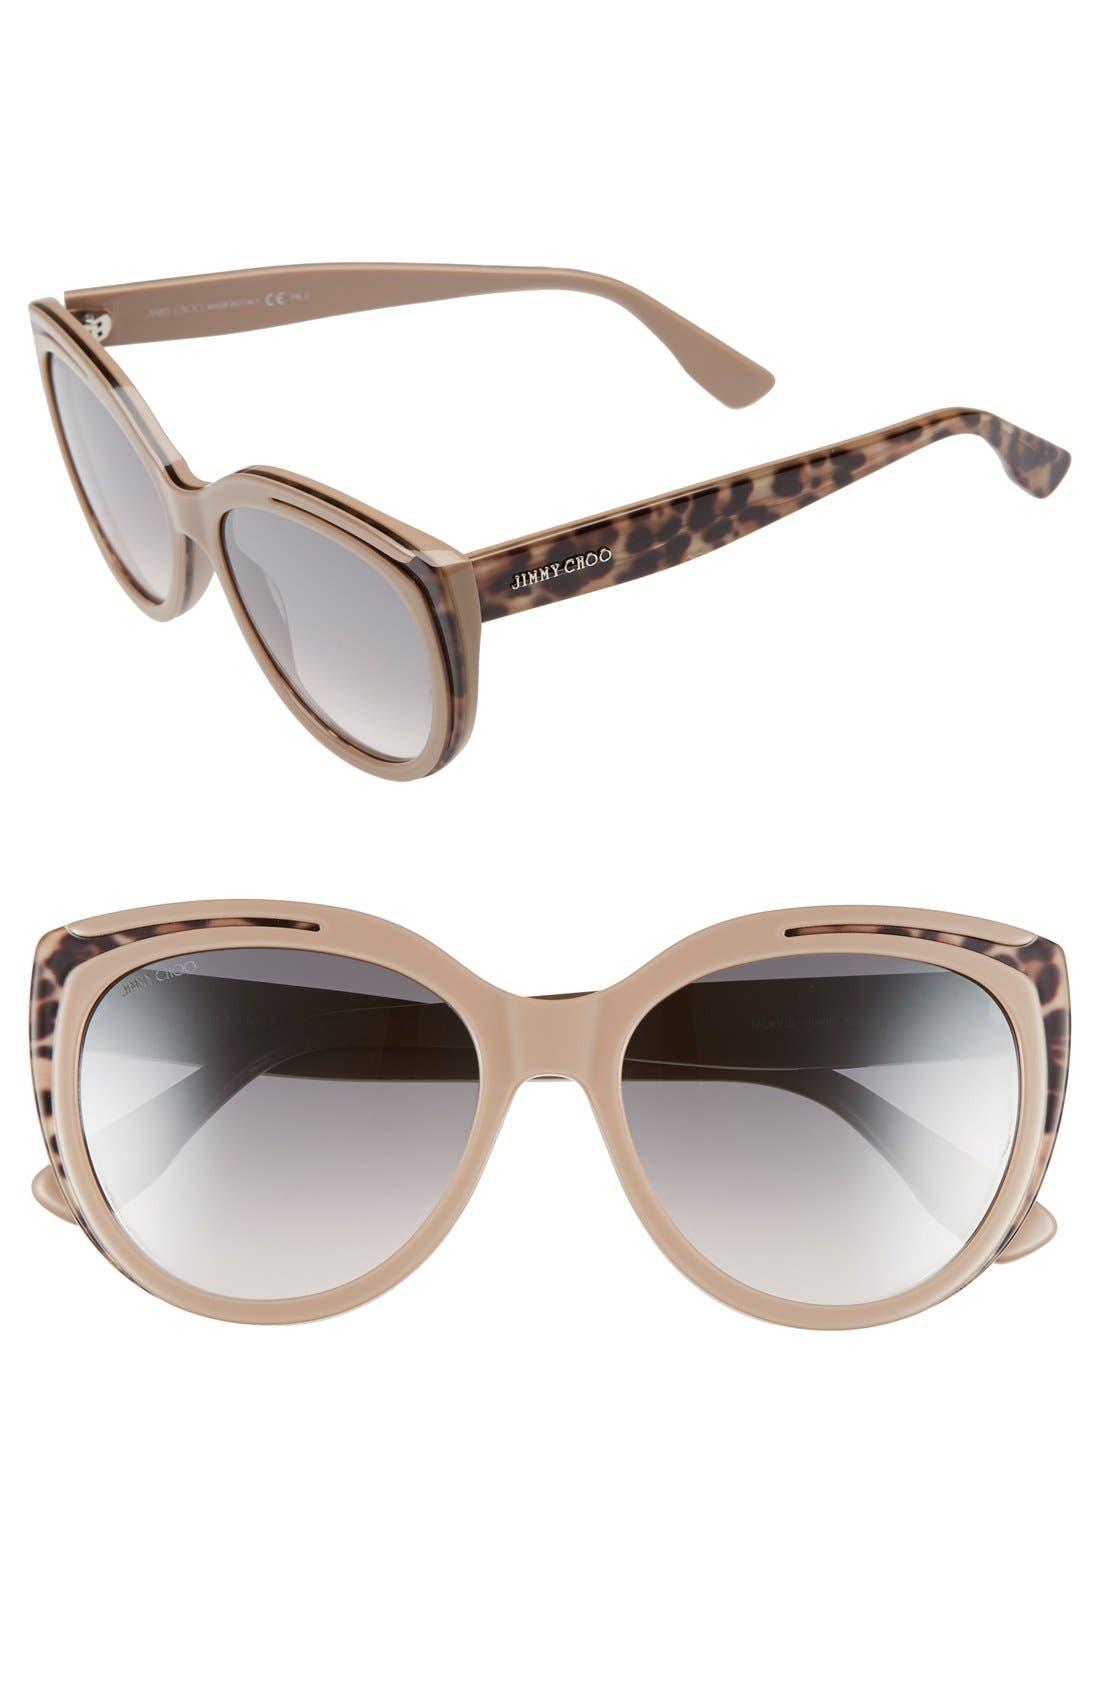 Alternate Image 1 Selected - Jimmy Choo 'Nicky' 56mm Cat Eye Sunglasses